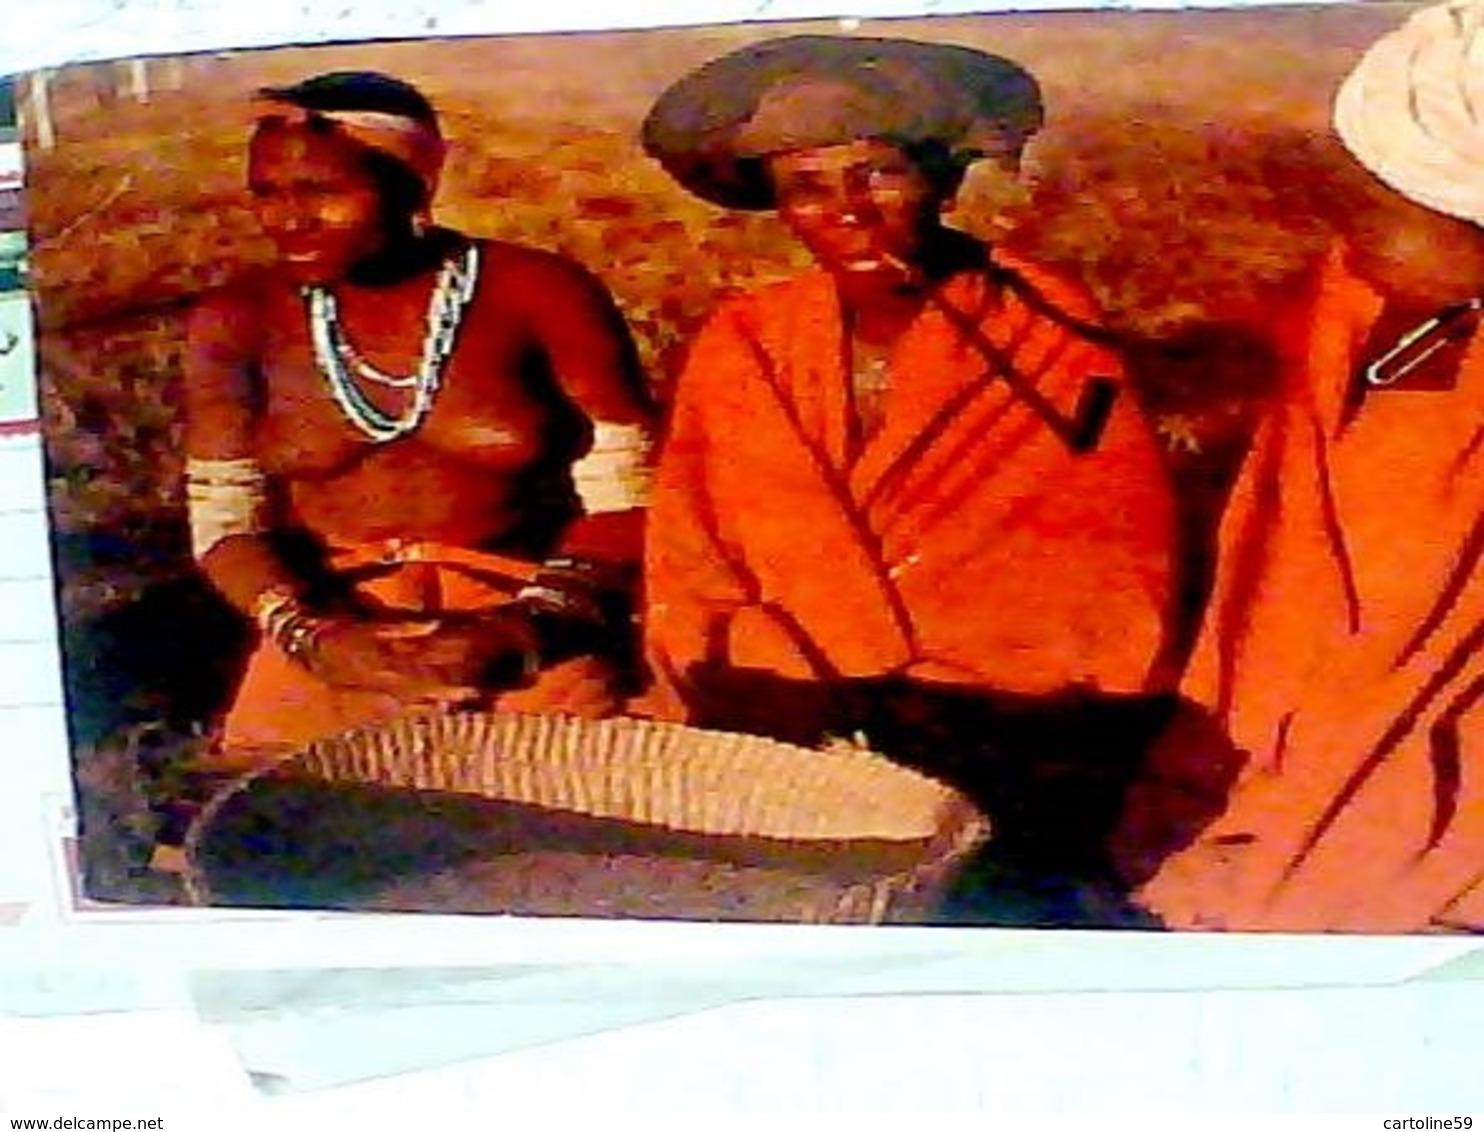 RSA SOUTH AFRICA BANTU-LIFE : People Of The Red Blanket SENO NUDO  PIPA FUMO TABACCO  N1975 HB8468 - Sud Africa